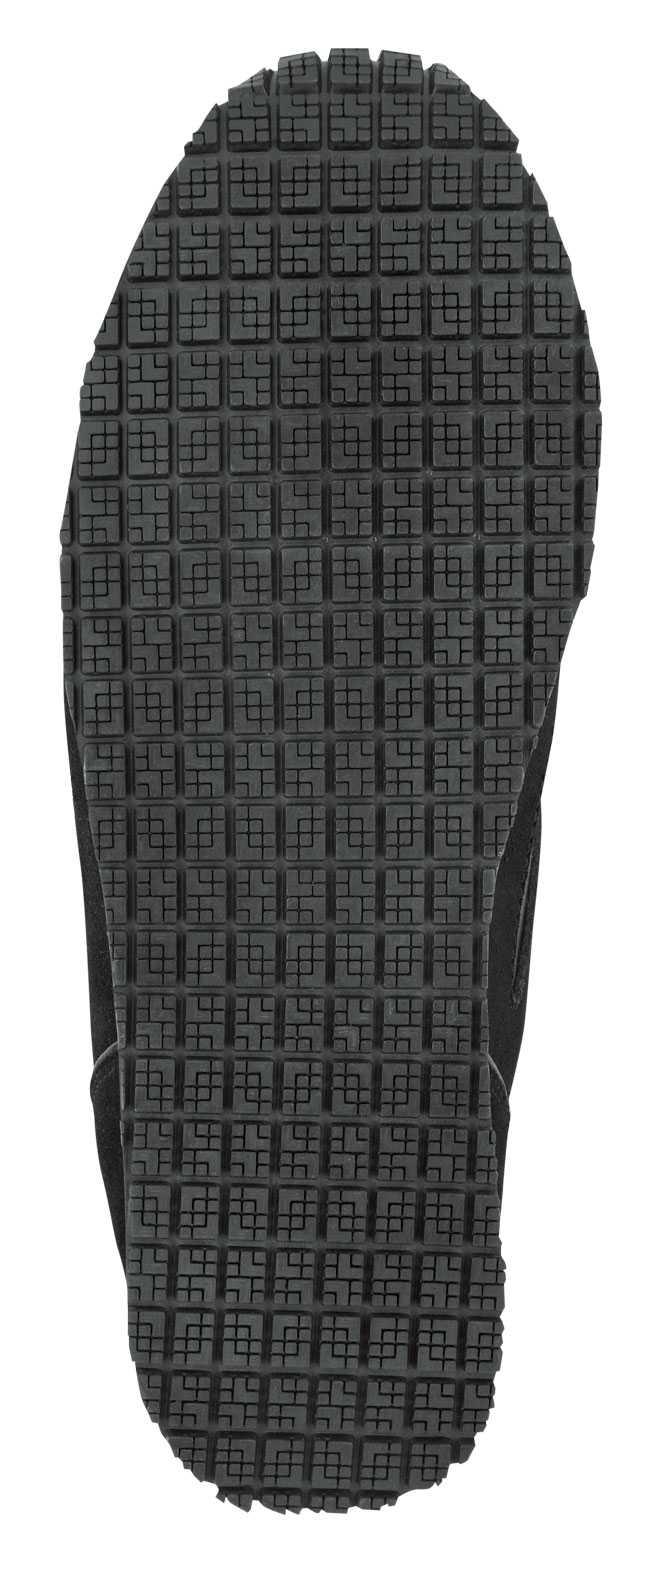 Reebok SRB972 Women's Black/Grey, Soft Toe, Slip Resistant, Prelaris MaxTrax Jogger